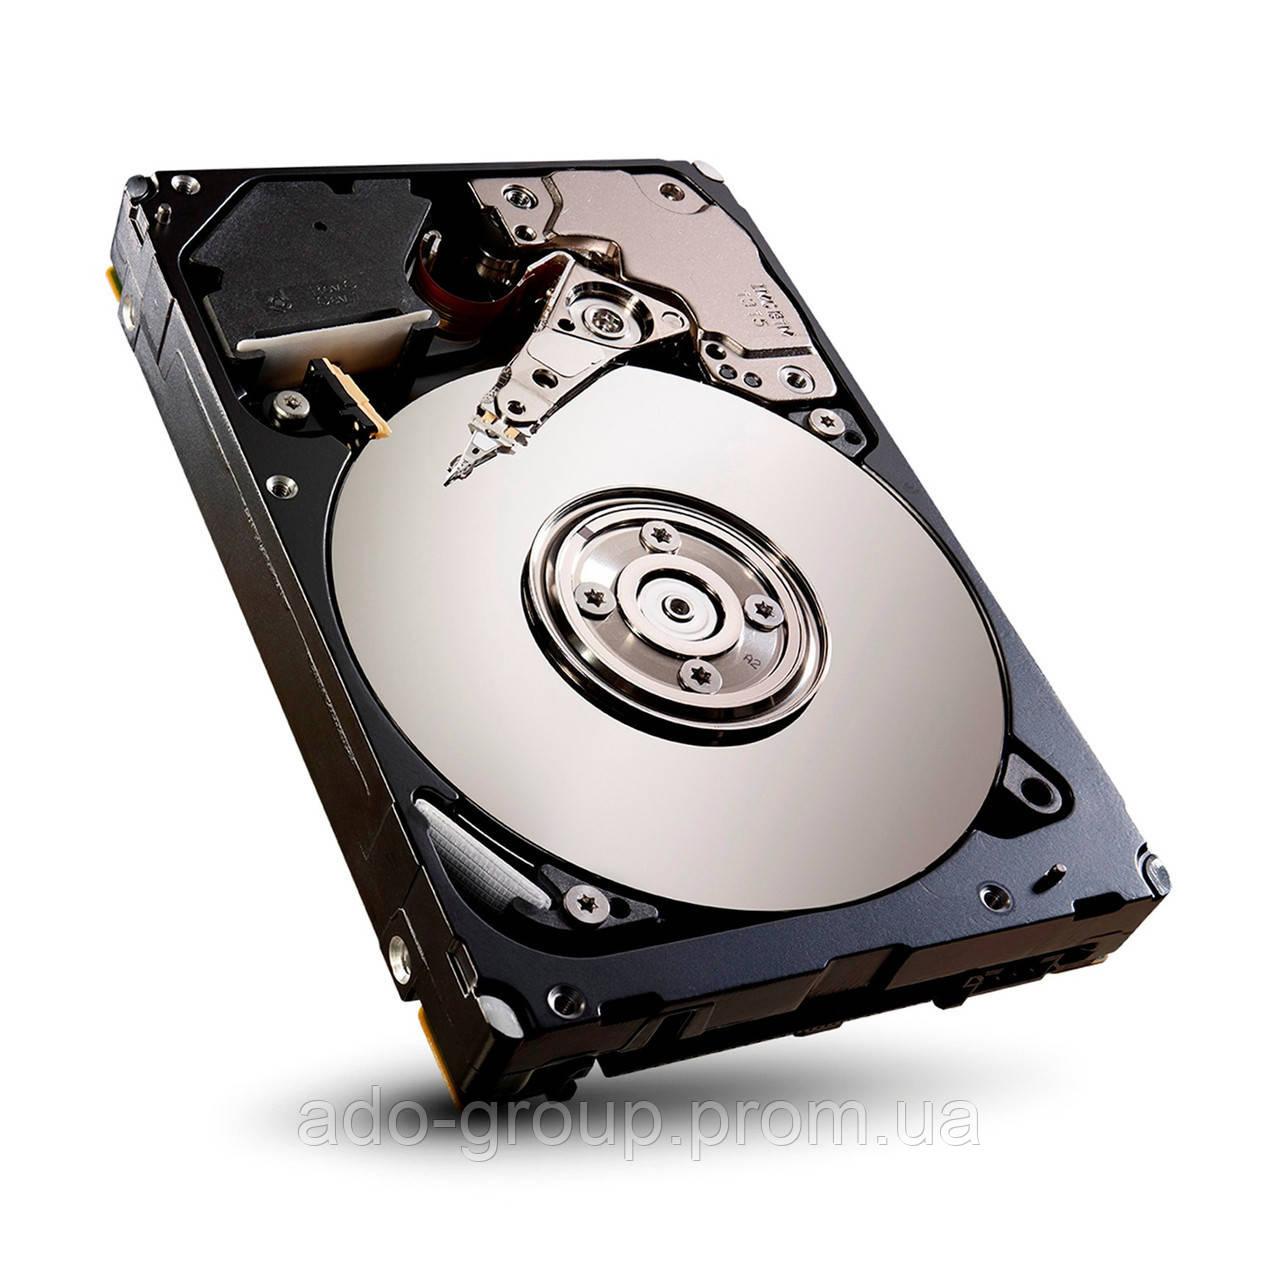 "H8799 Жесткий диск Dell 73GB SAS 15K  3.5"" +"